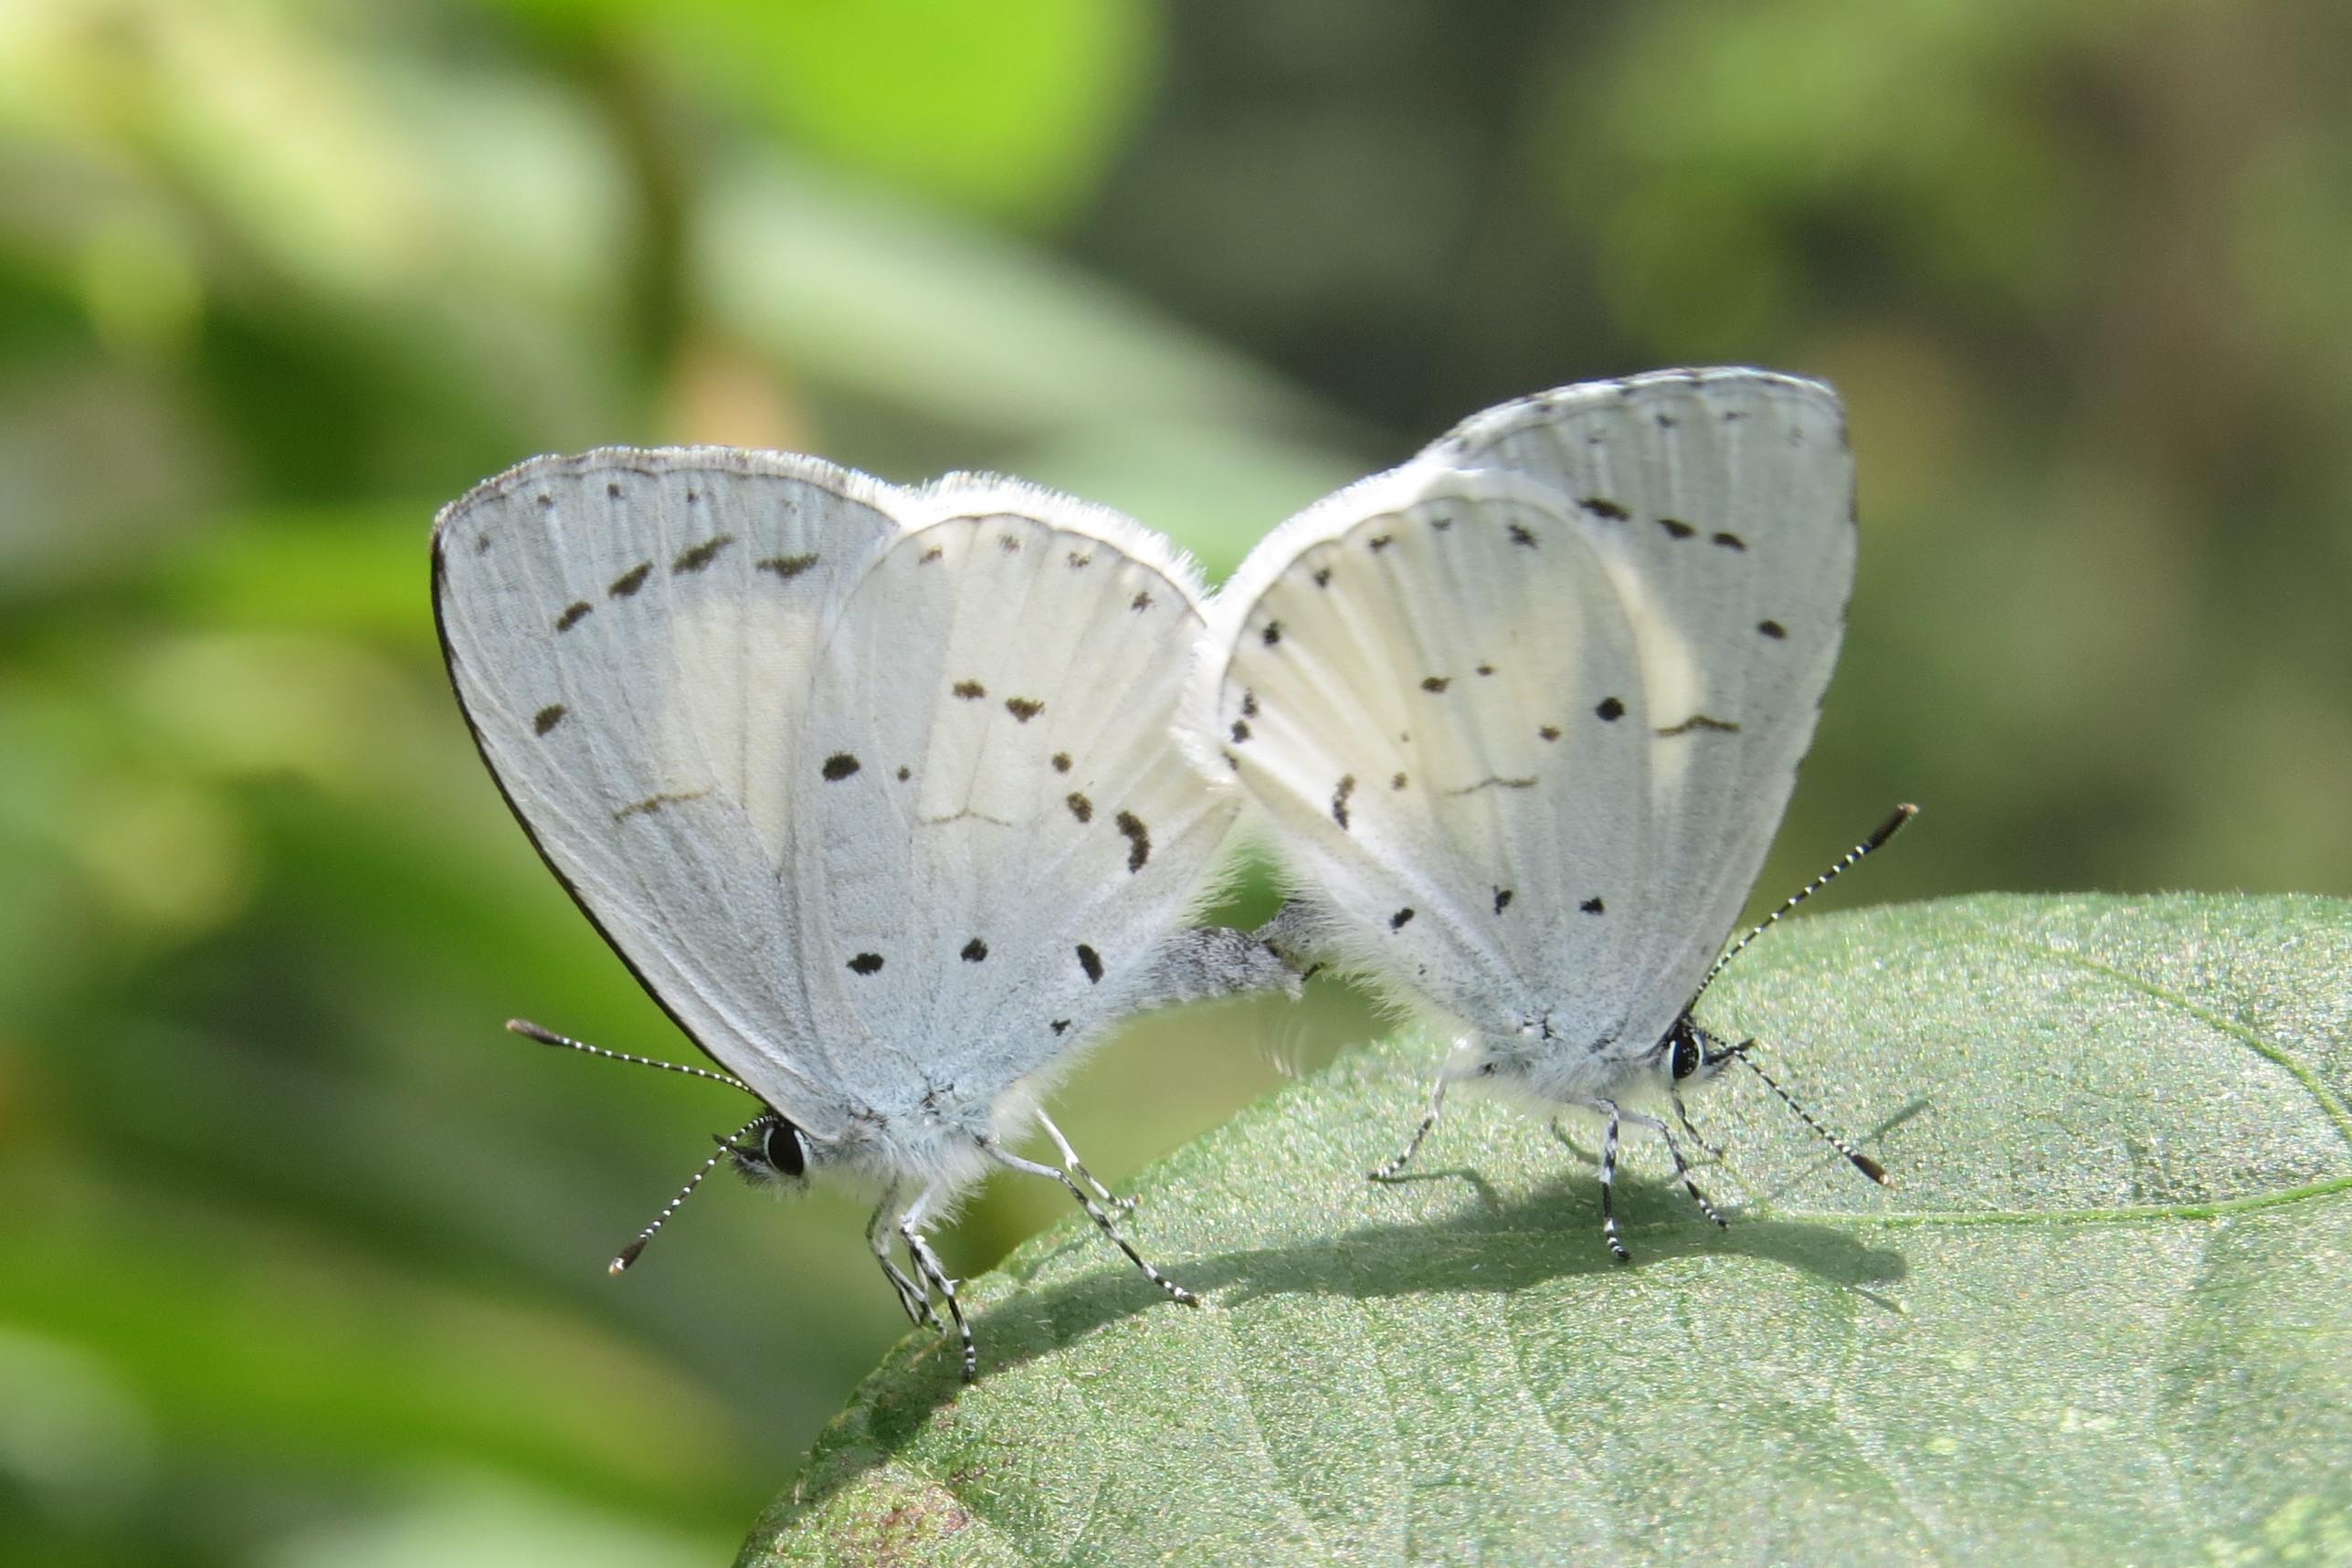 Bộ sưu tập cánh vẩy 4 - Page 3 Udara_akasa_Horsfield%2C_1828_%E2%80%93_White_Hedge_Blue_at_Mannavan_Shola%2C_Anamudi_Shola_National_Park%2C_Kerala_%2811%29